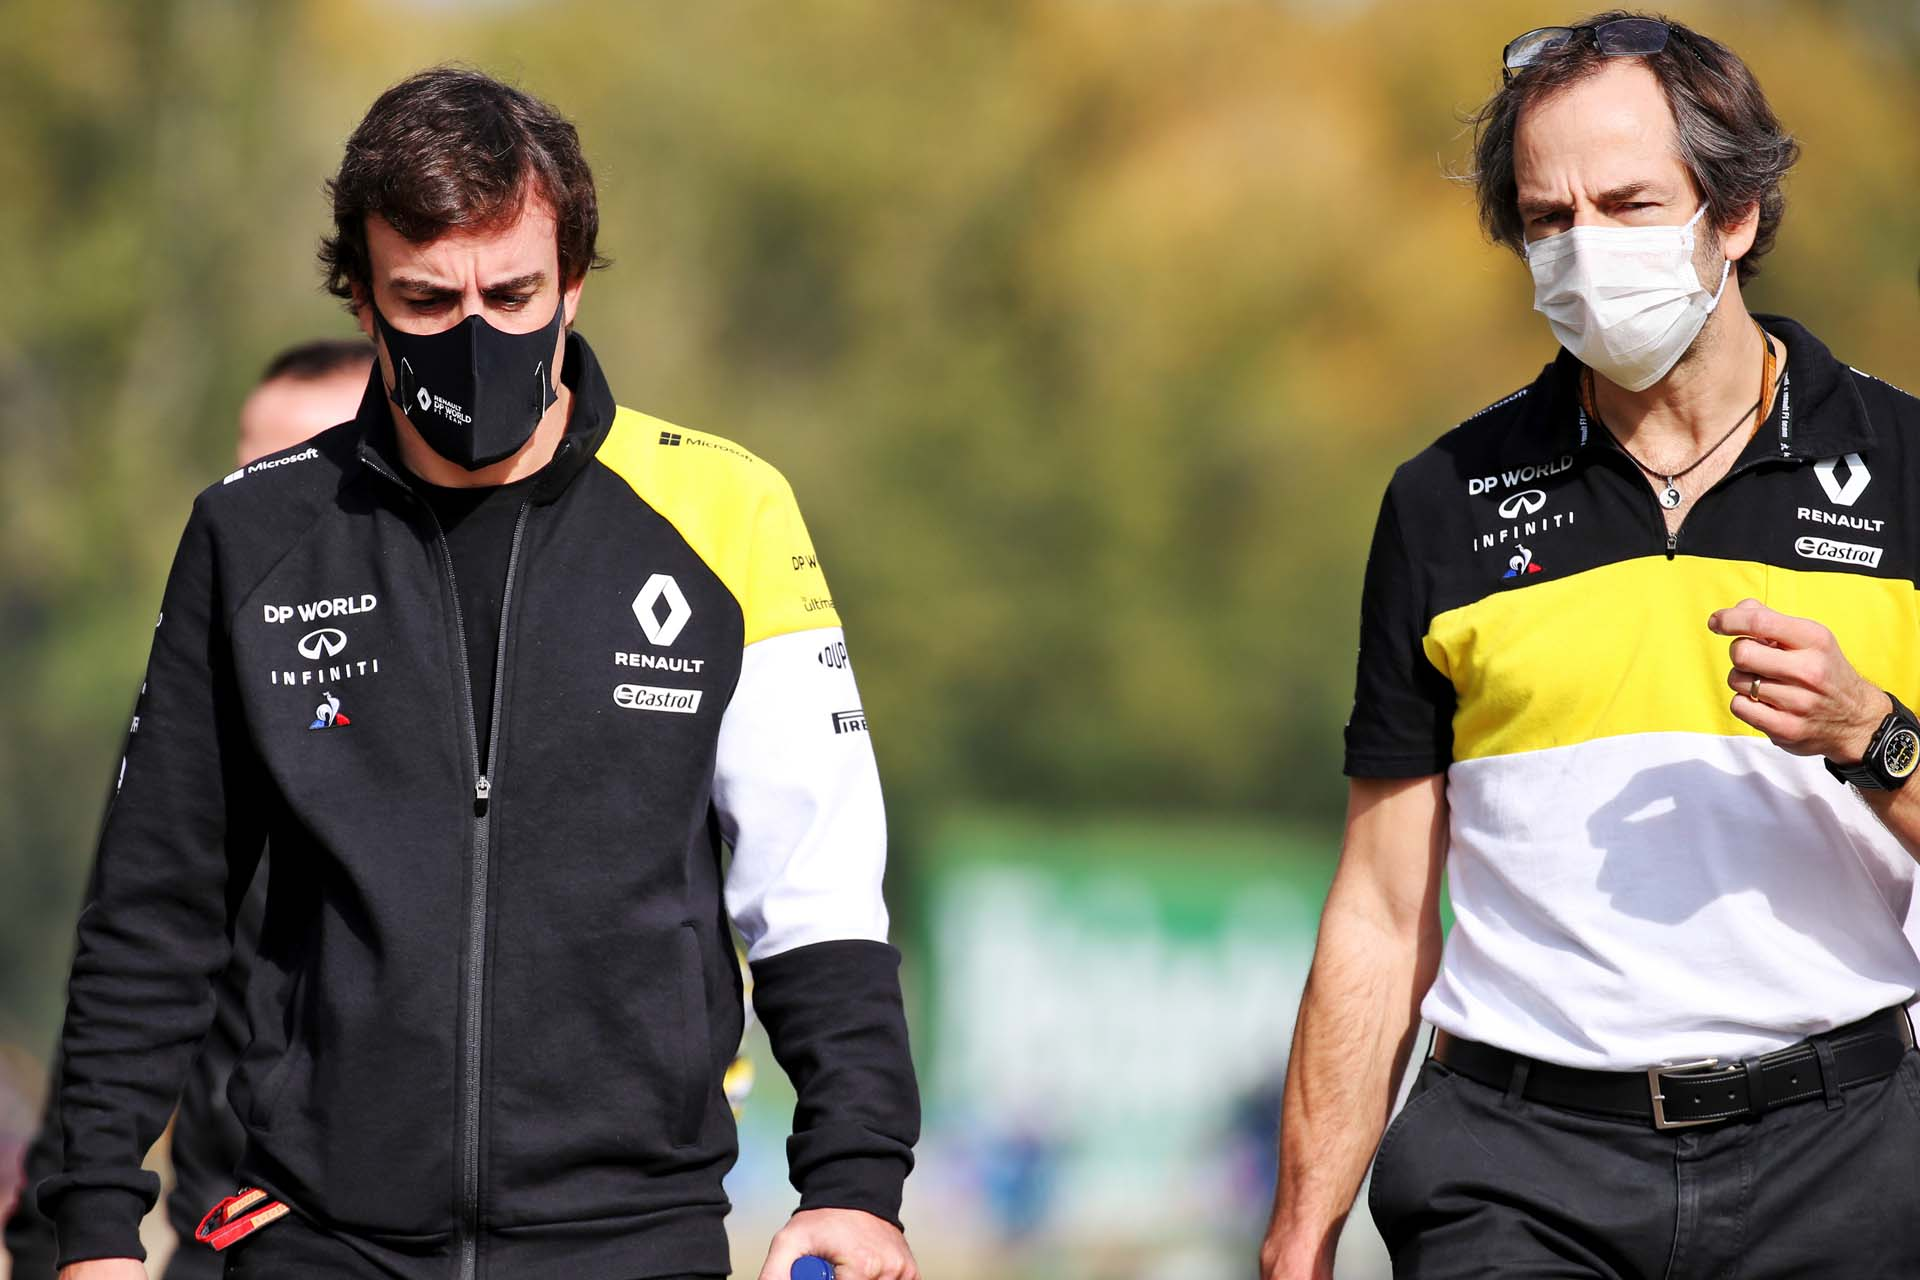 Motor Racing - Formula One World Championship - Emilia Romagna Grand Prix - Preparation Day - Imola, Italy